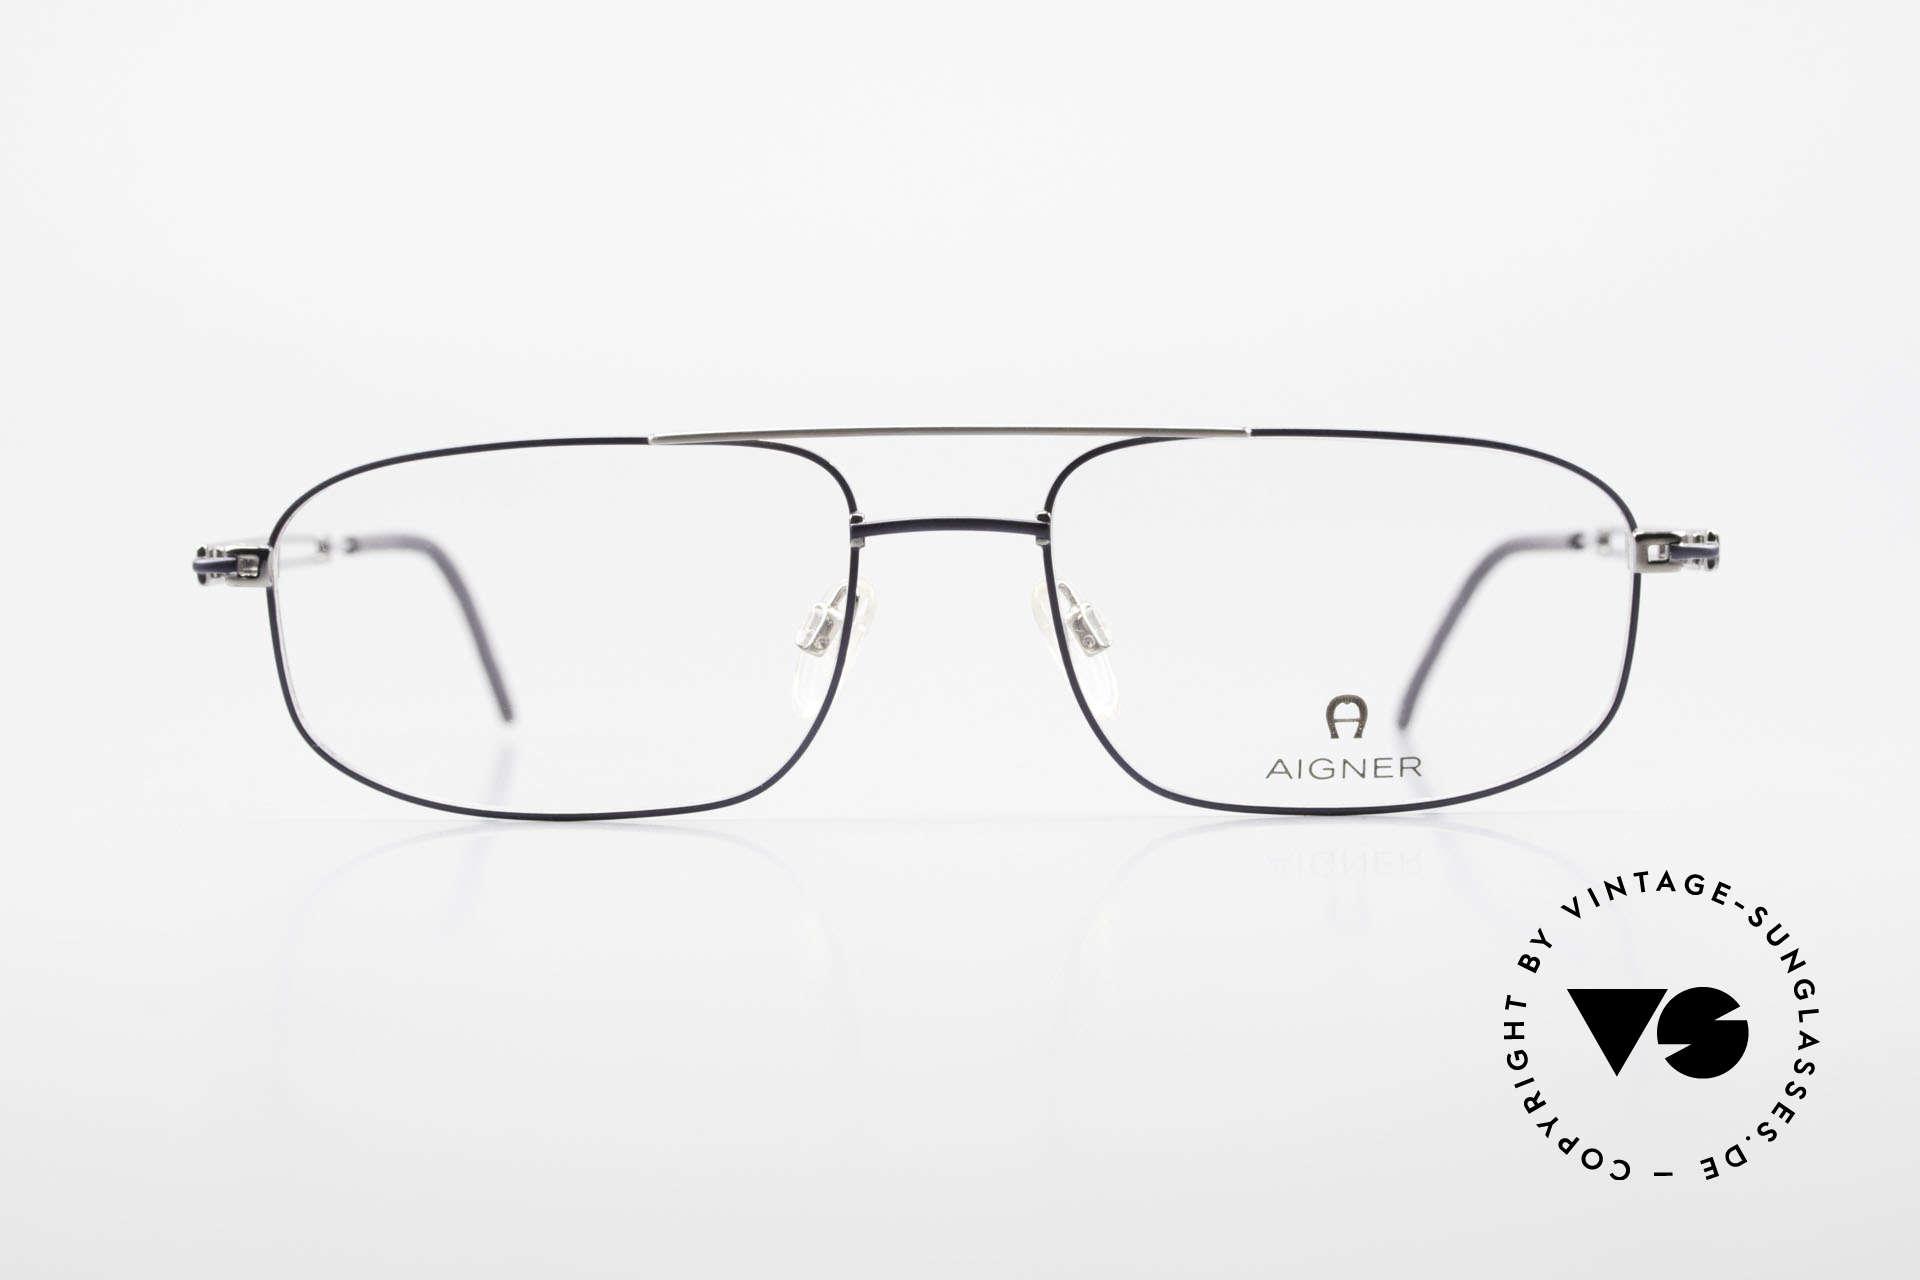 Aigner EA9111 90's Men's Eyeglasses Metal, 90's original Aigner eyewear in cooperation with Metzler, Made for Men